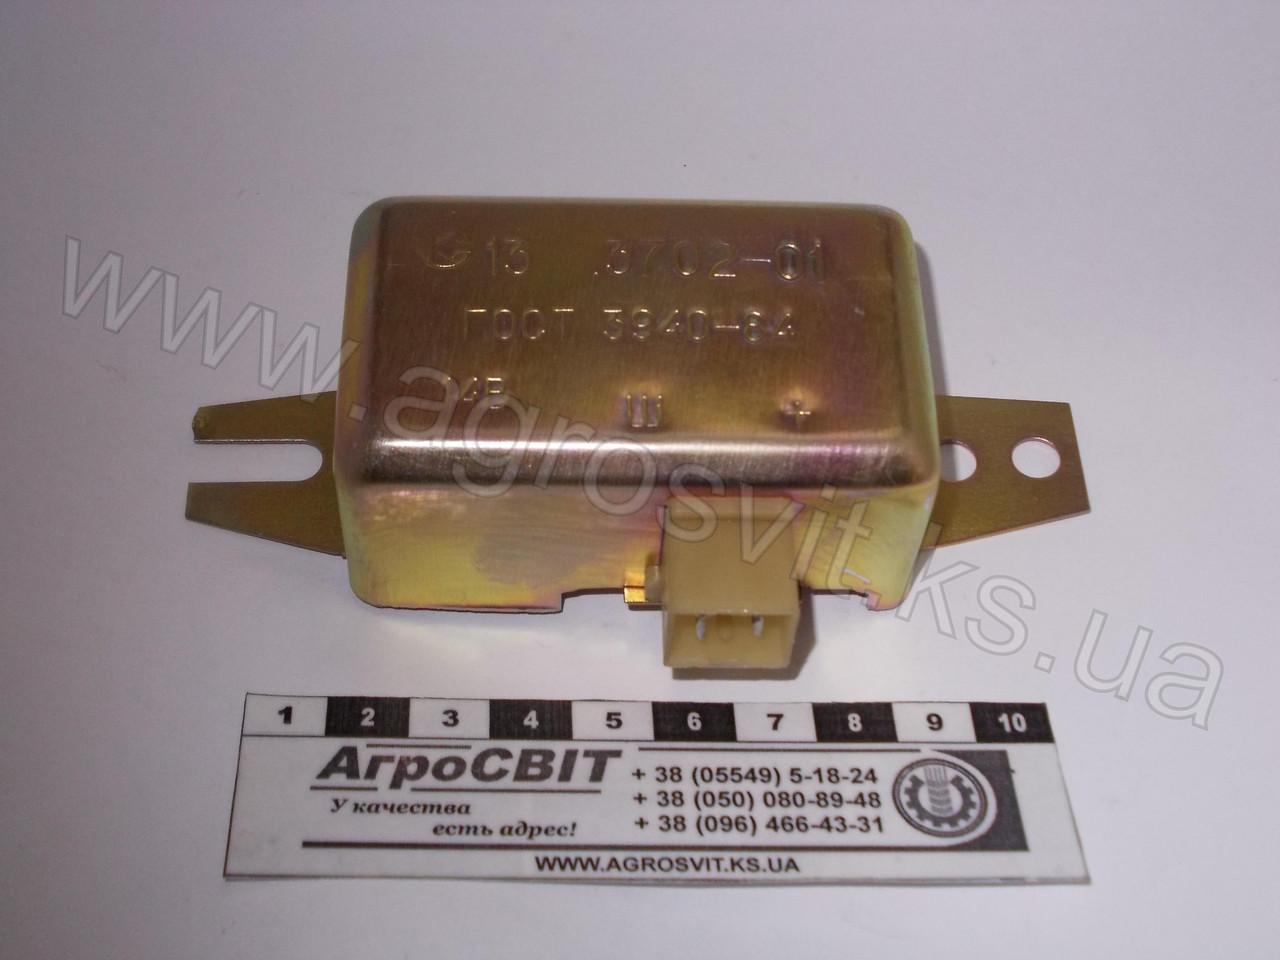 Регулятор напряжения ГАЗ-53, арт. 13.3702-01 (шт.)